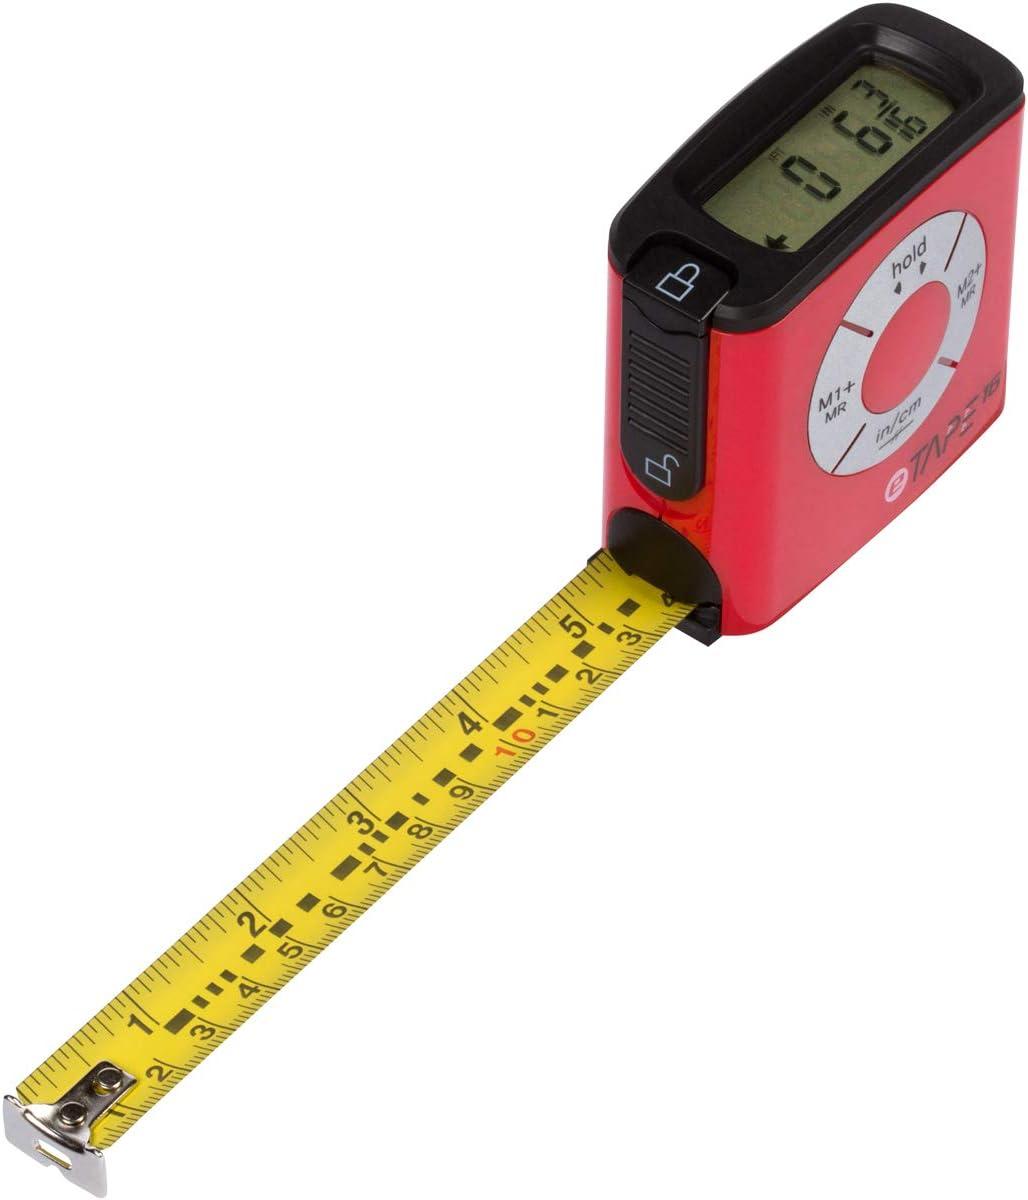 eTape16 Digital Electronic Tape Measure